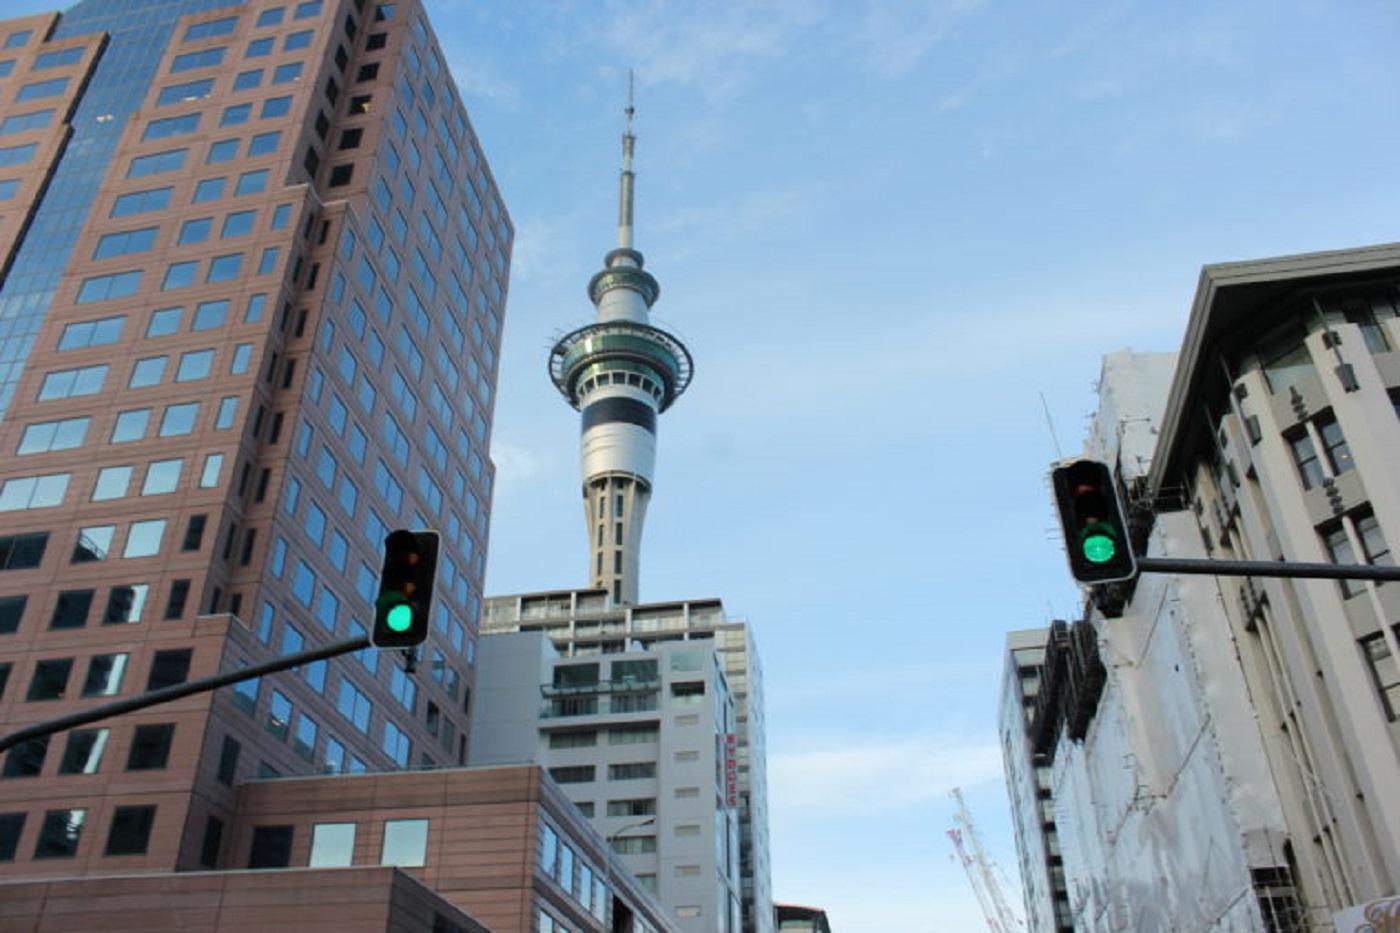 SkyTower, na Nova Zelândia (Foto: Tati Sisti)